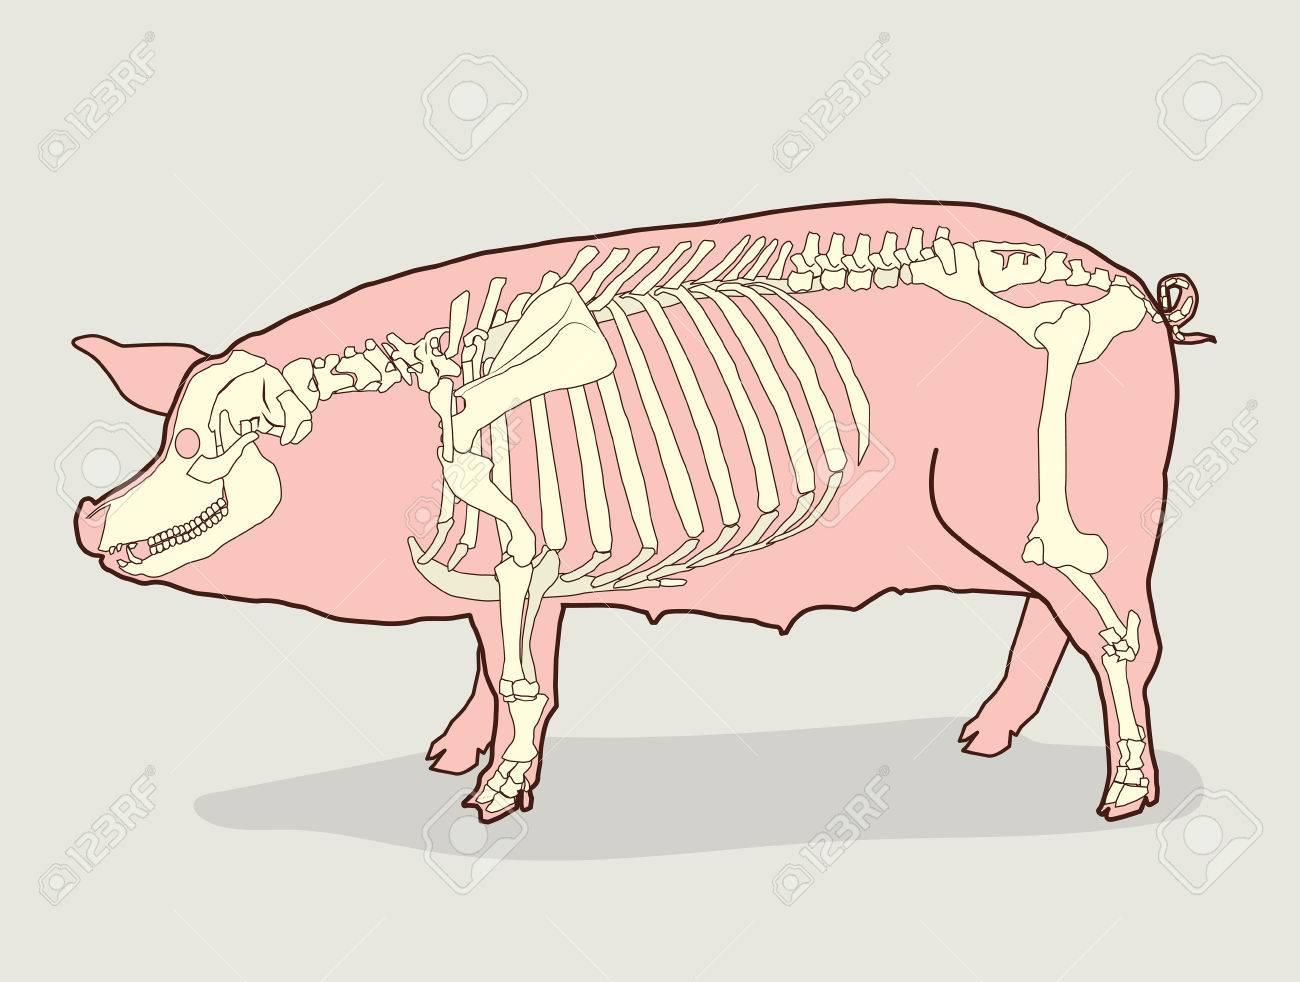 hight resolution of pig skeleton vector illustration pig skeleton diagram pig skeleton for sale pig